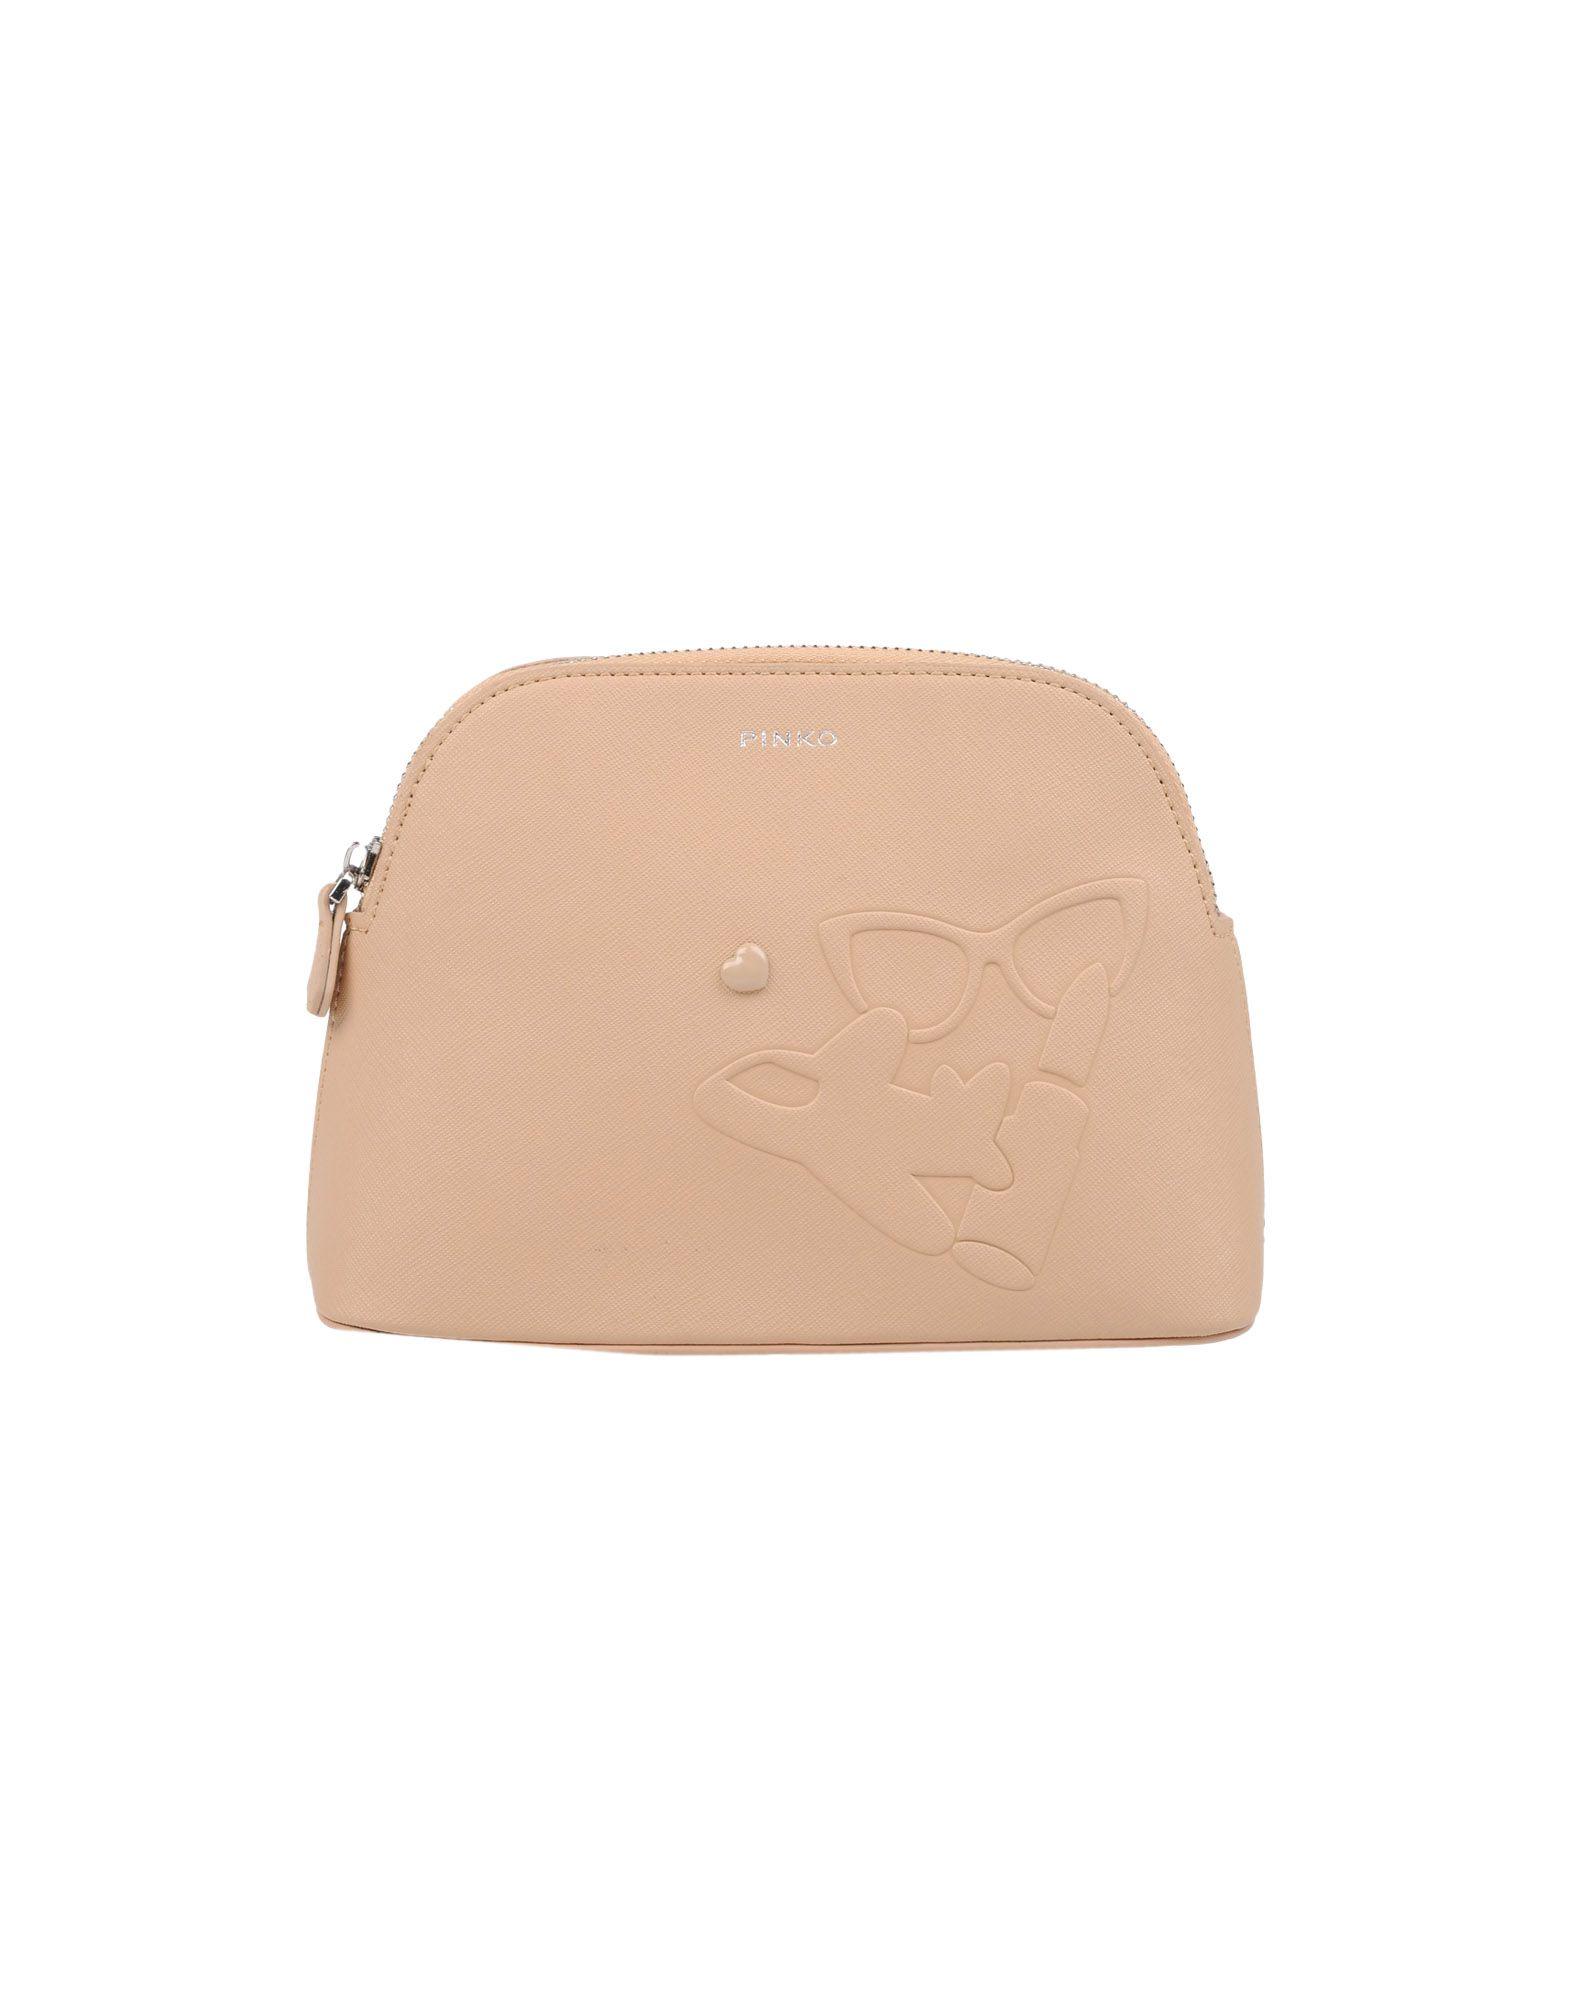 PINKO Beauty case